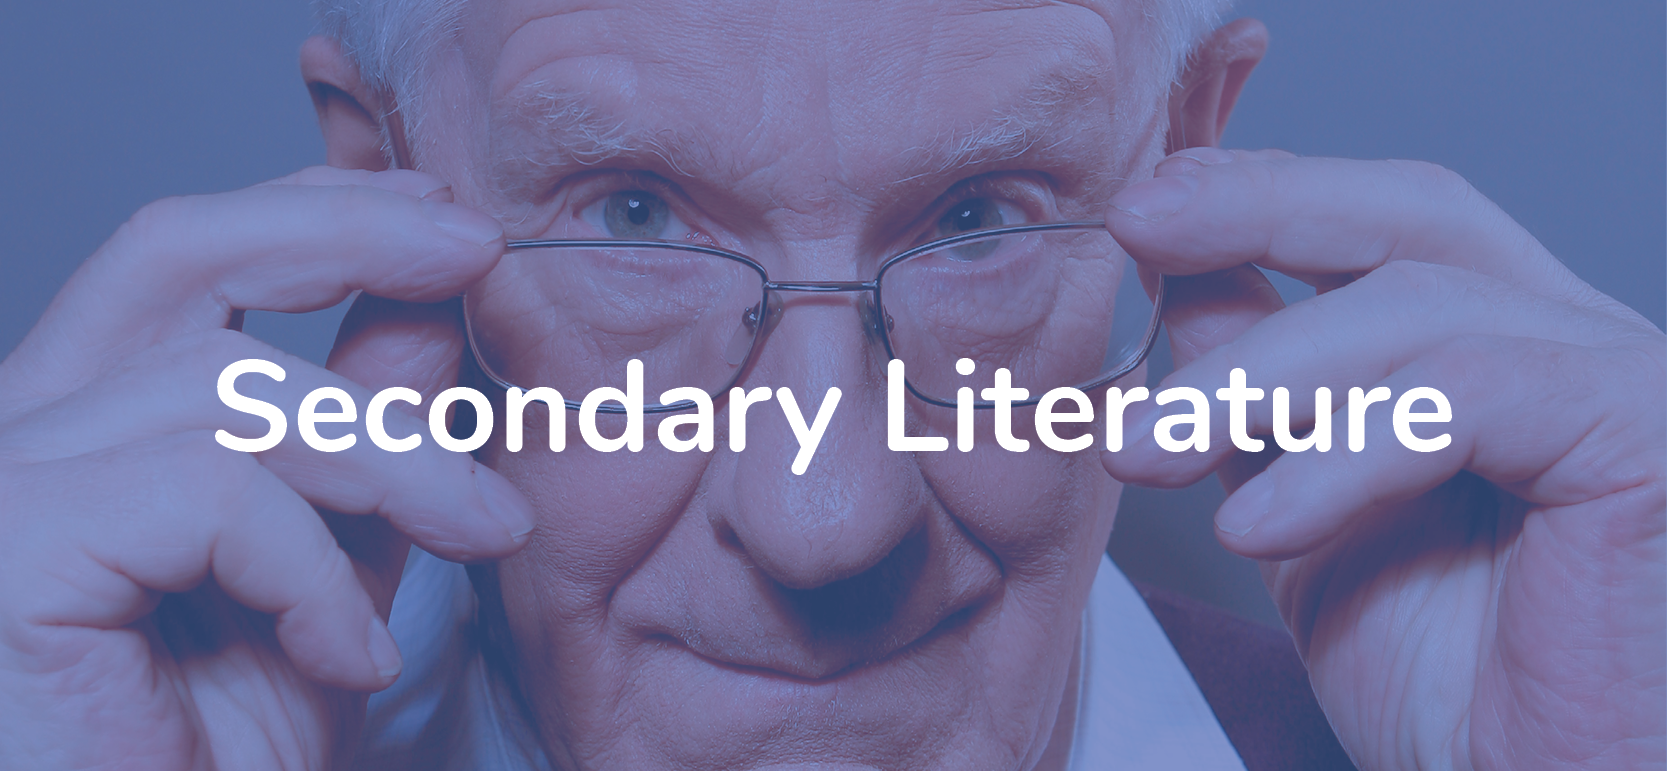 Secondary Literature